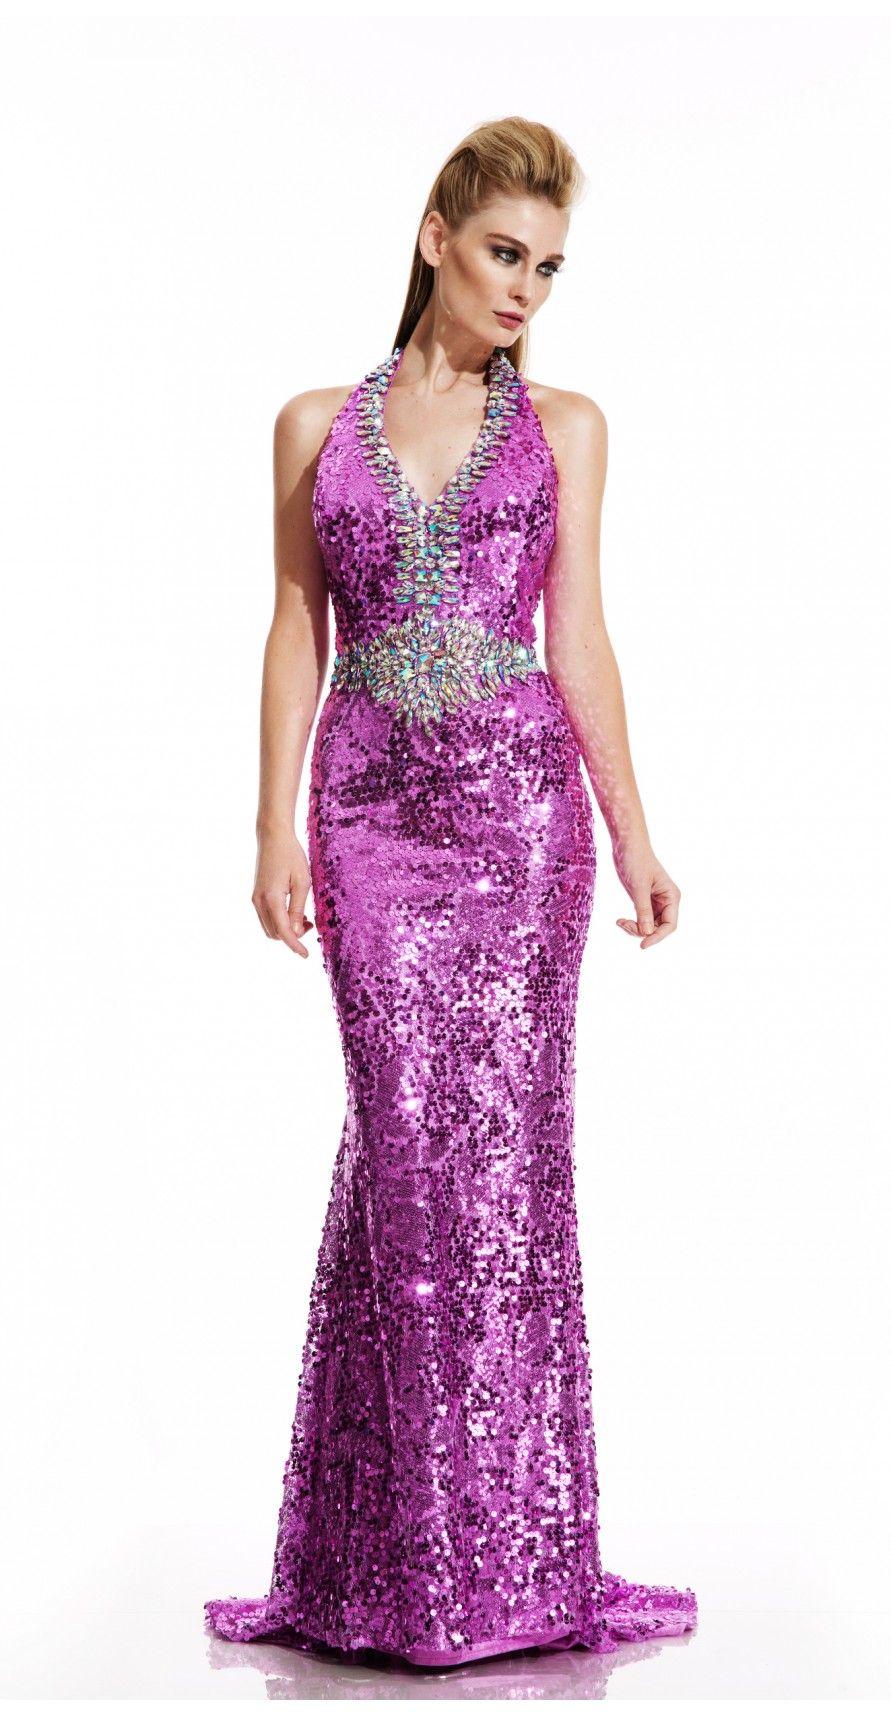 Lujo Vestidos De Dama Jenny Packham Regalo - Ideas de Vestidos de ...